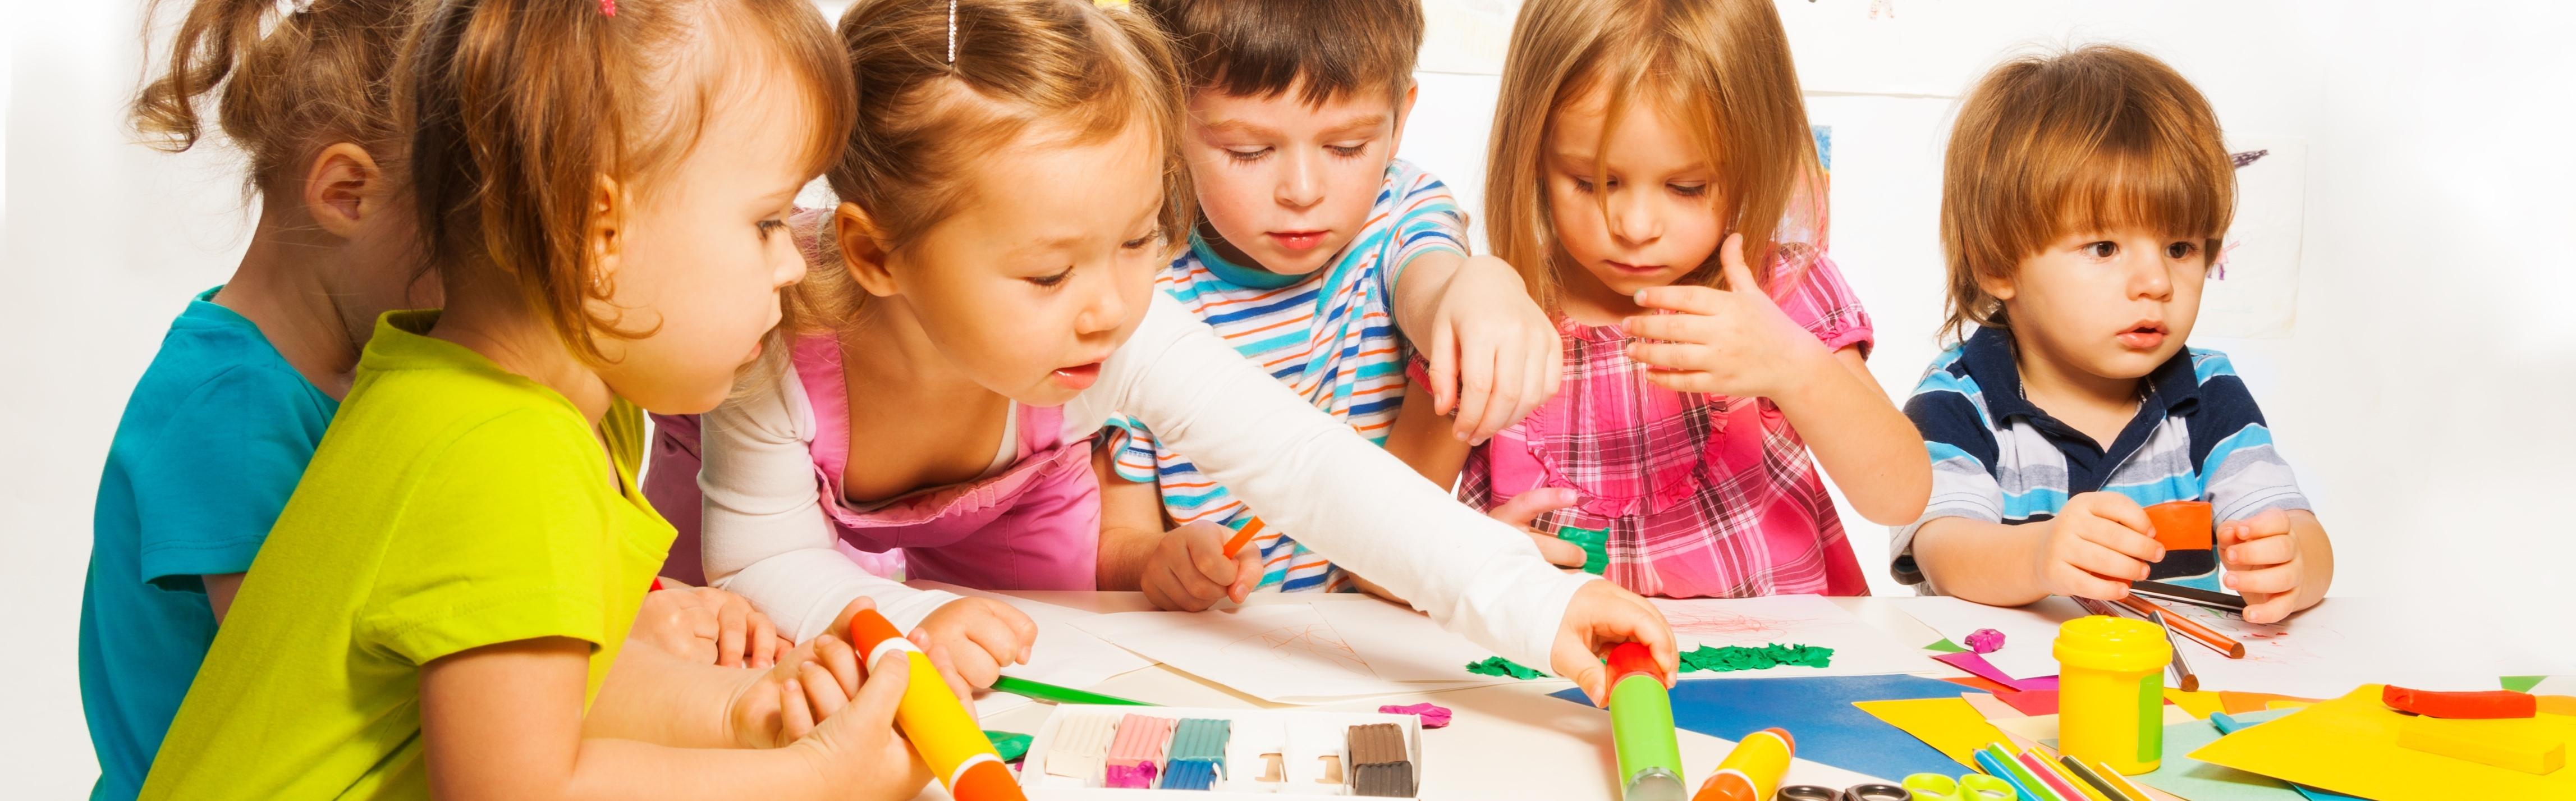 Choosing Childcare For Preschool